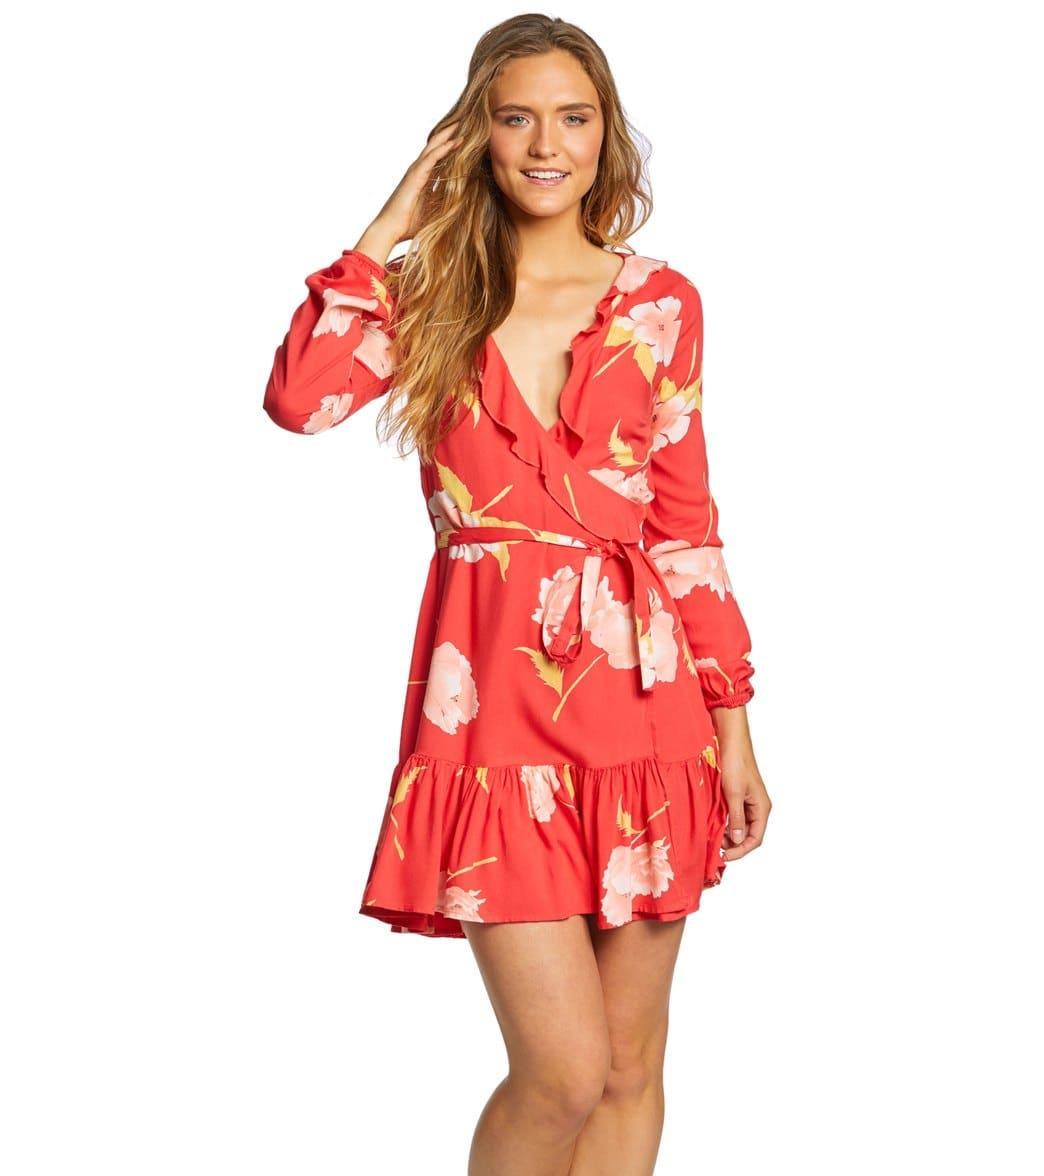 60457cda85 Billabong Women's Ruff Girls Club Long Sleeve Dress at SwimOutlet.com -  Free Shipping